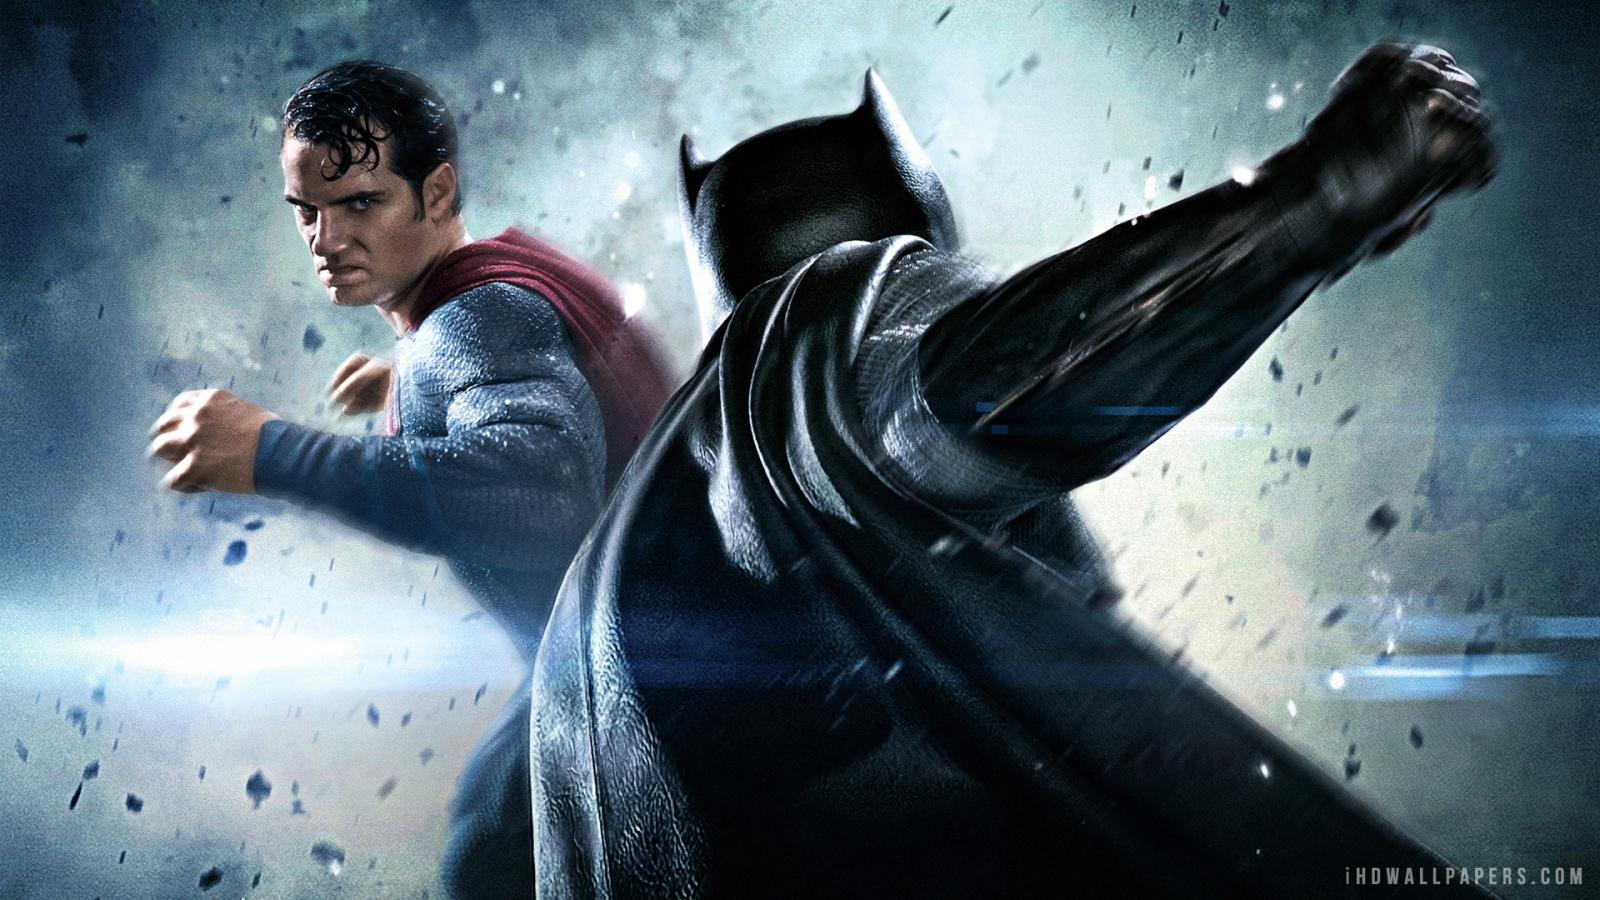 Batman V Superman Dawn of Justice New HD Wallpaper   iHD Wallpapers 1600x900